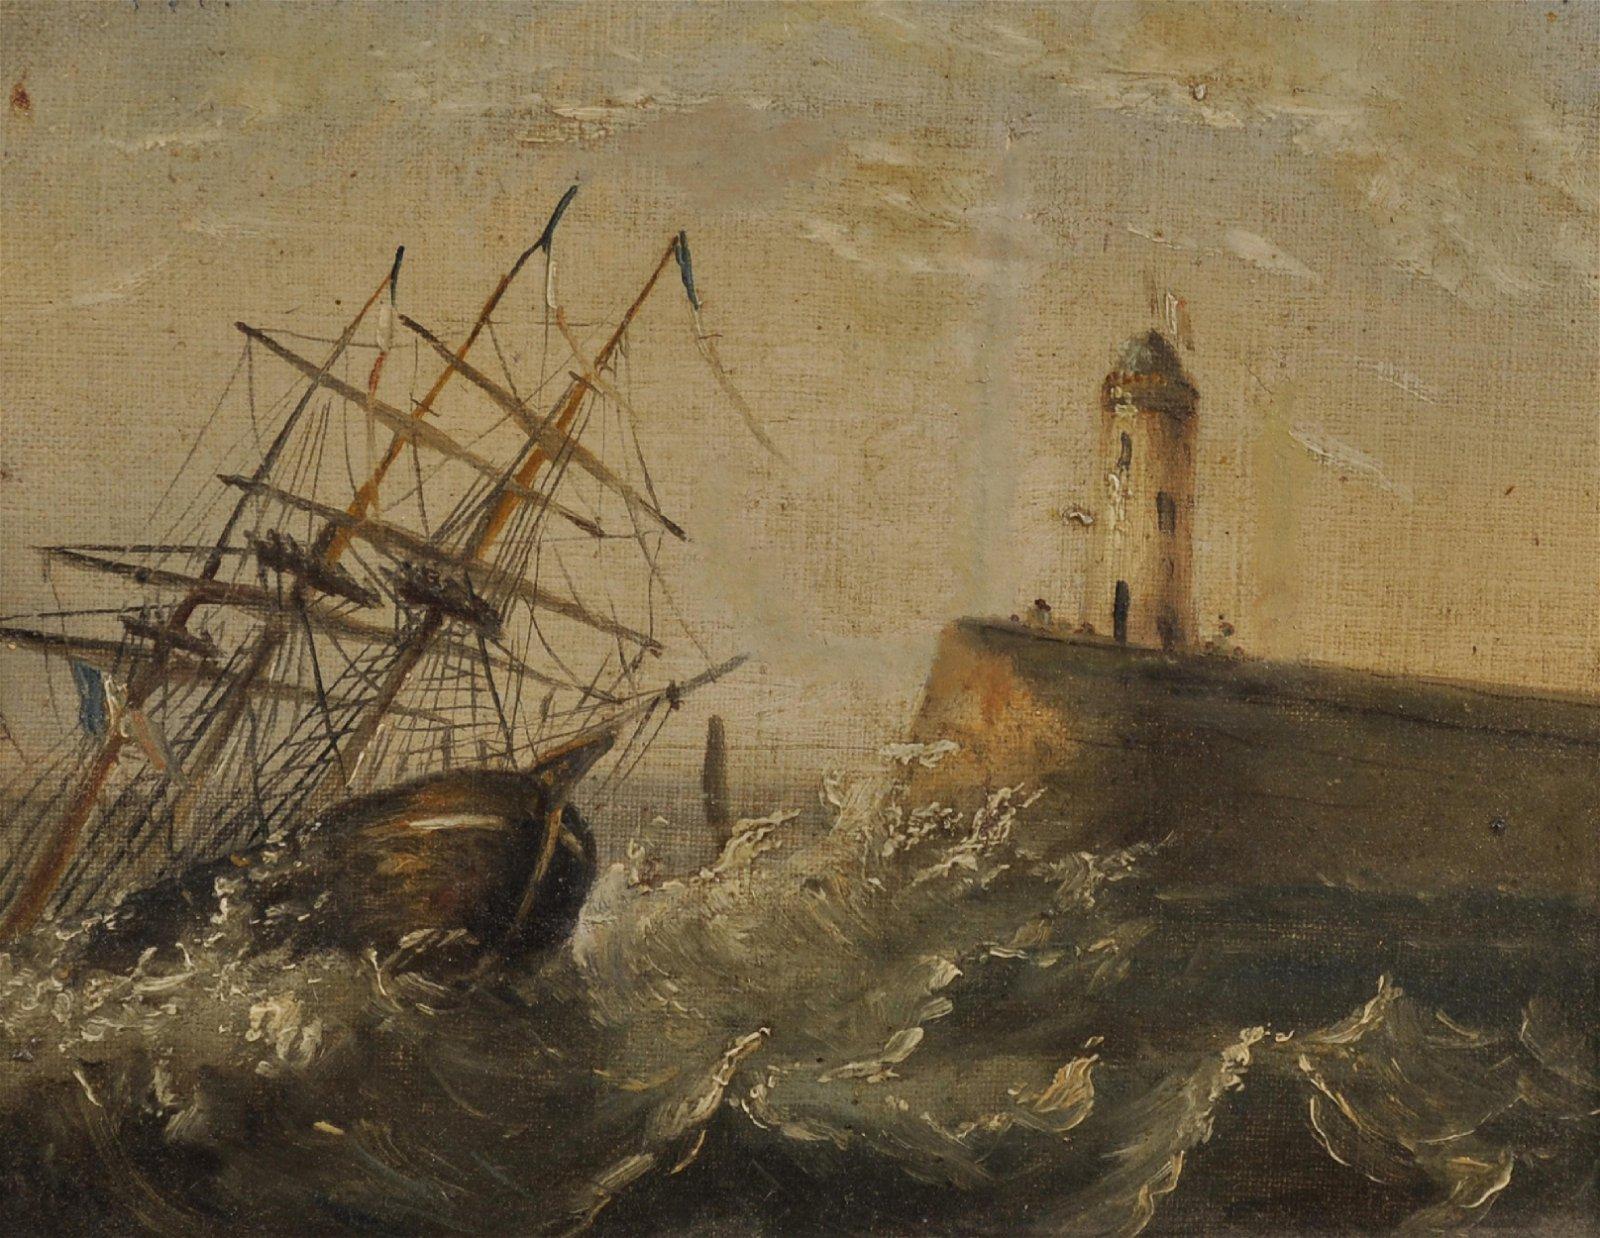 19th Century English School. A Three Masted Sailing